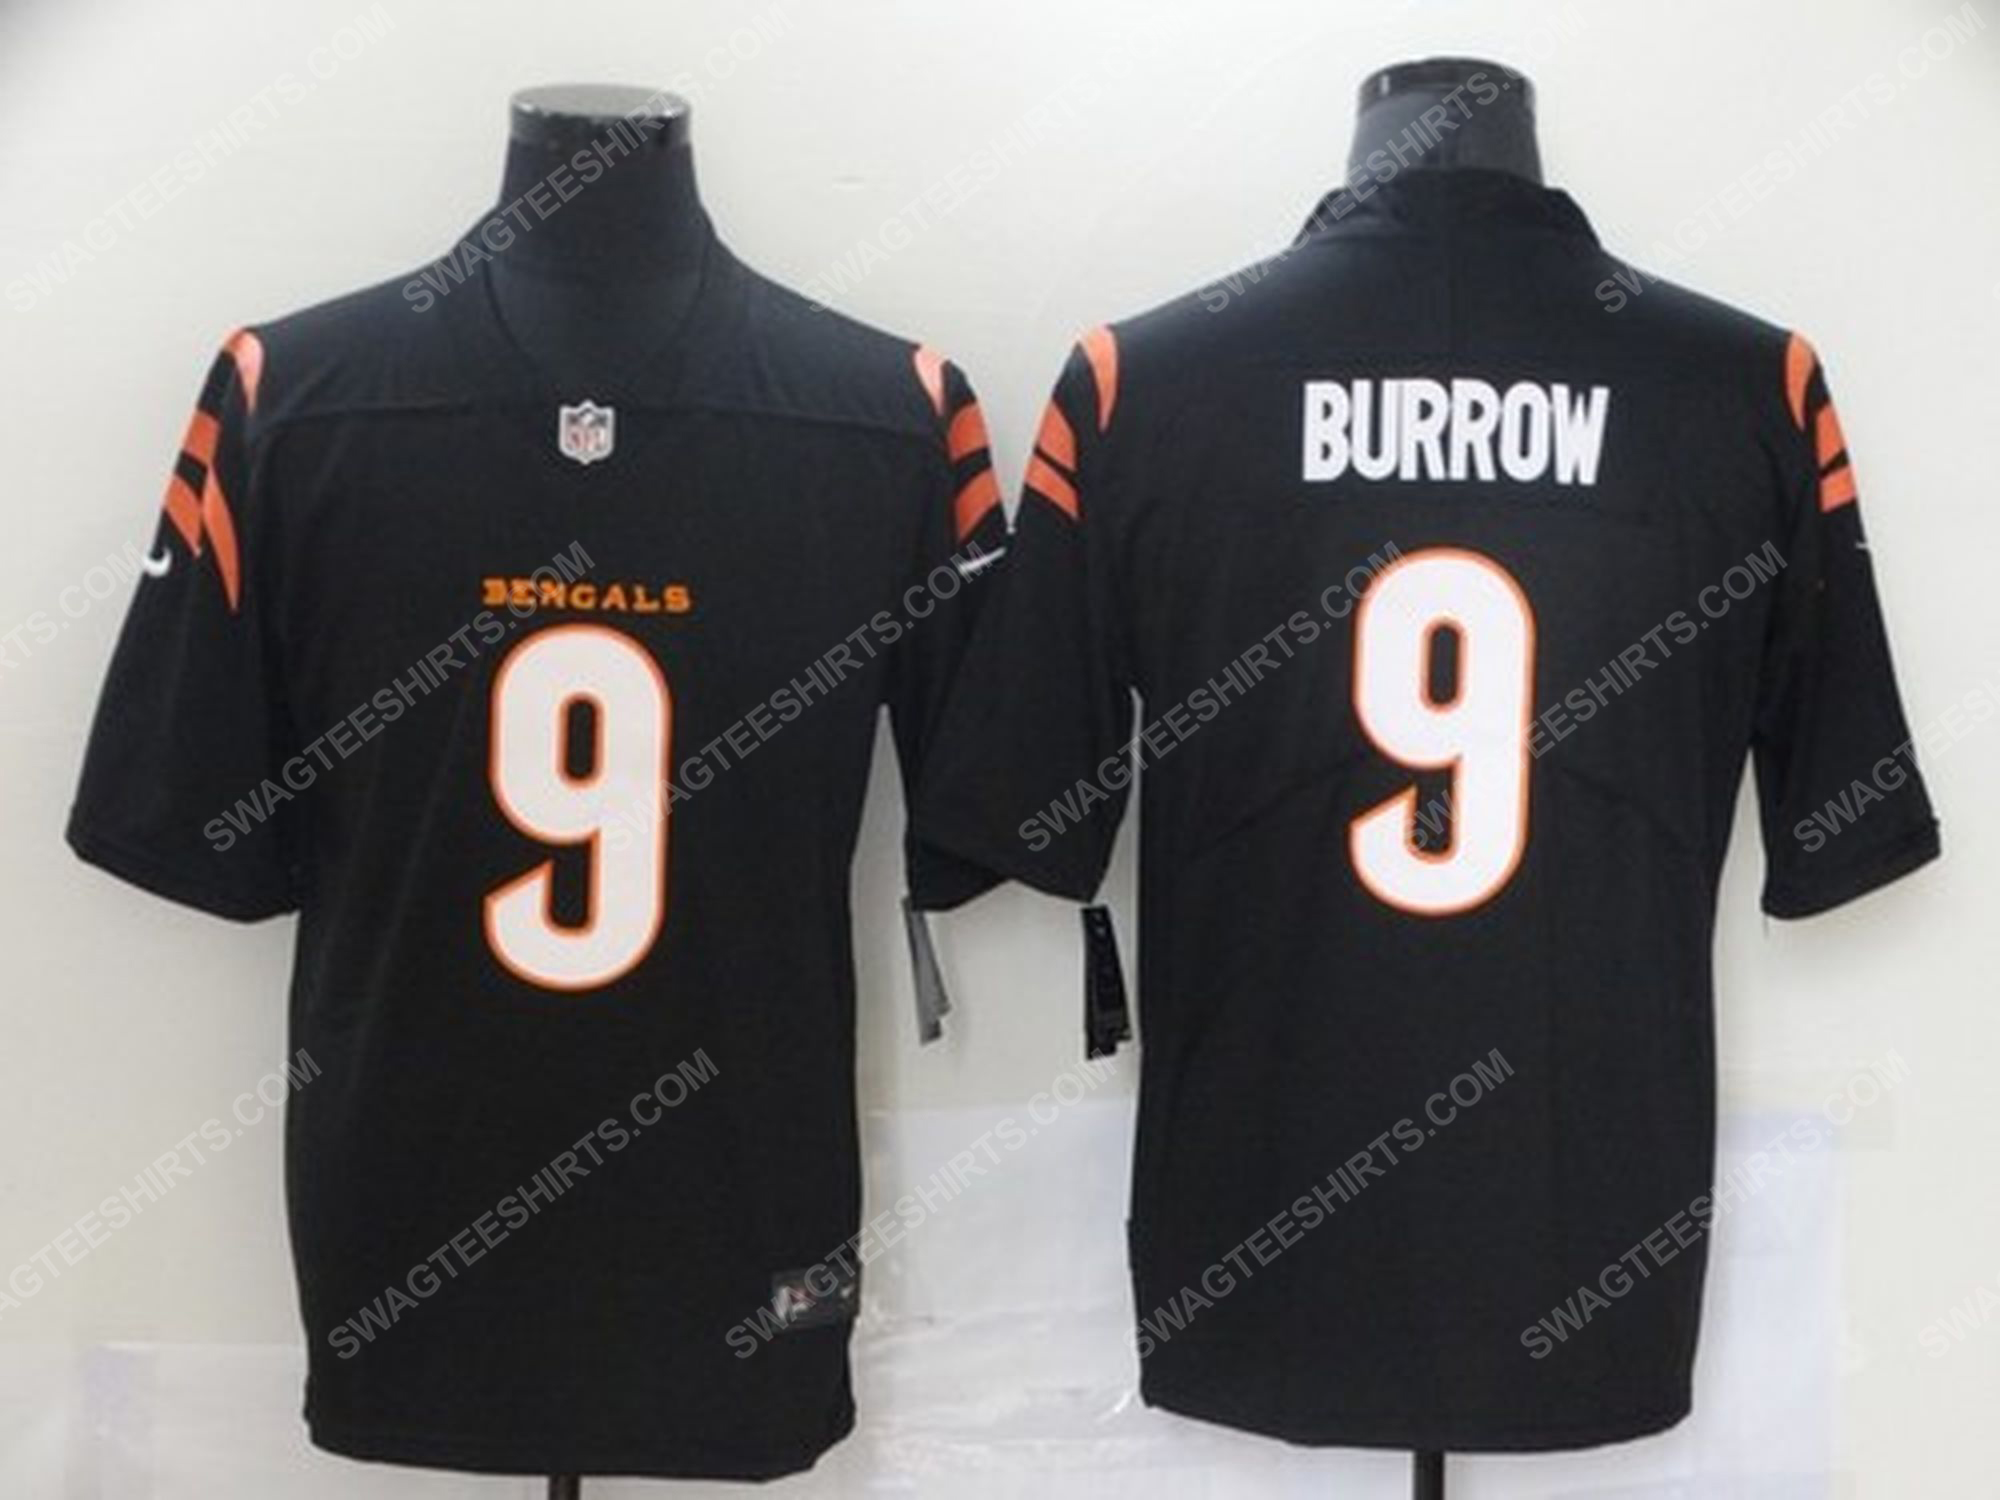 Custom name the cincinnati bengals nfl football jersey 1 - Copy (2)